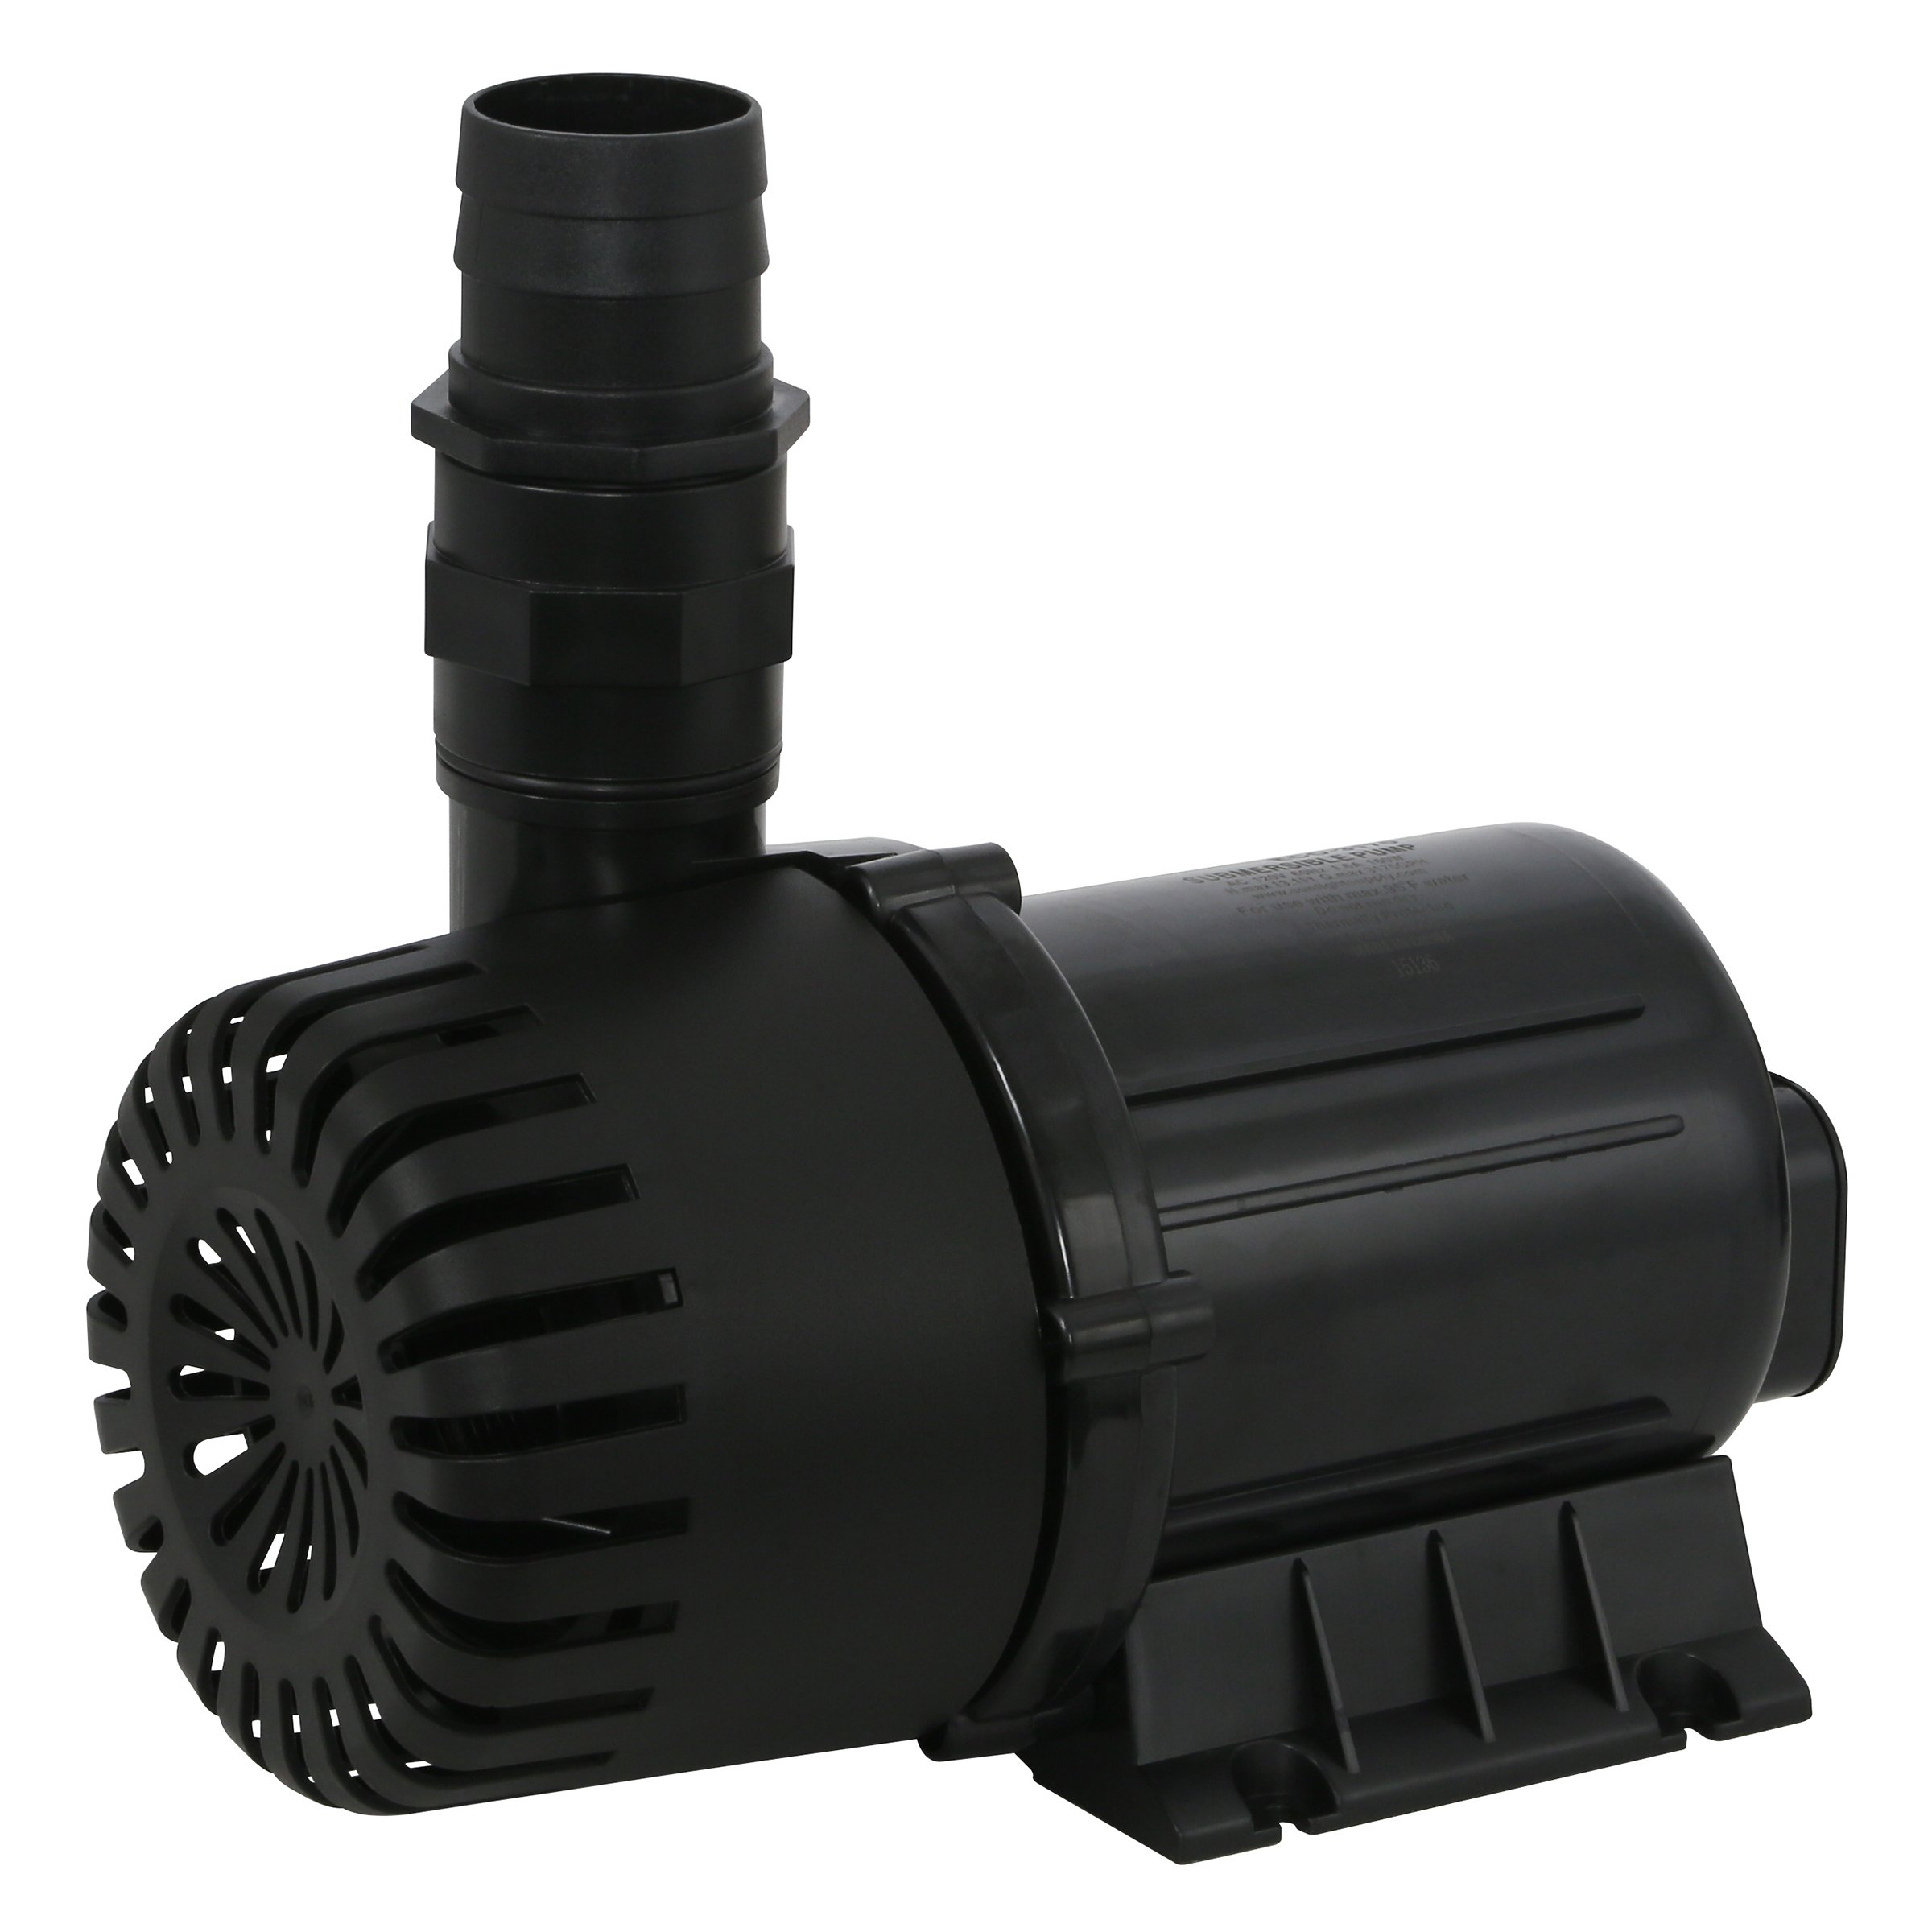 EcoPlus 3175 GPH (12018 LPH, 160W) Submersible Water Pump w/ 30 ft Power Cord | Aquarium, Fish Tank, Fountain, Pond, Hydroponics by EcoPlus